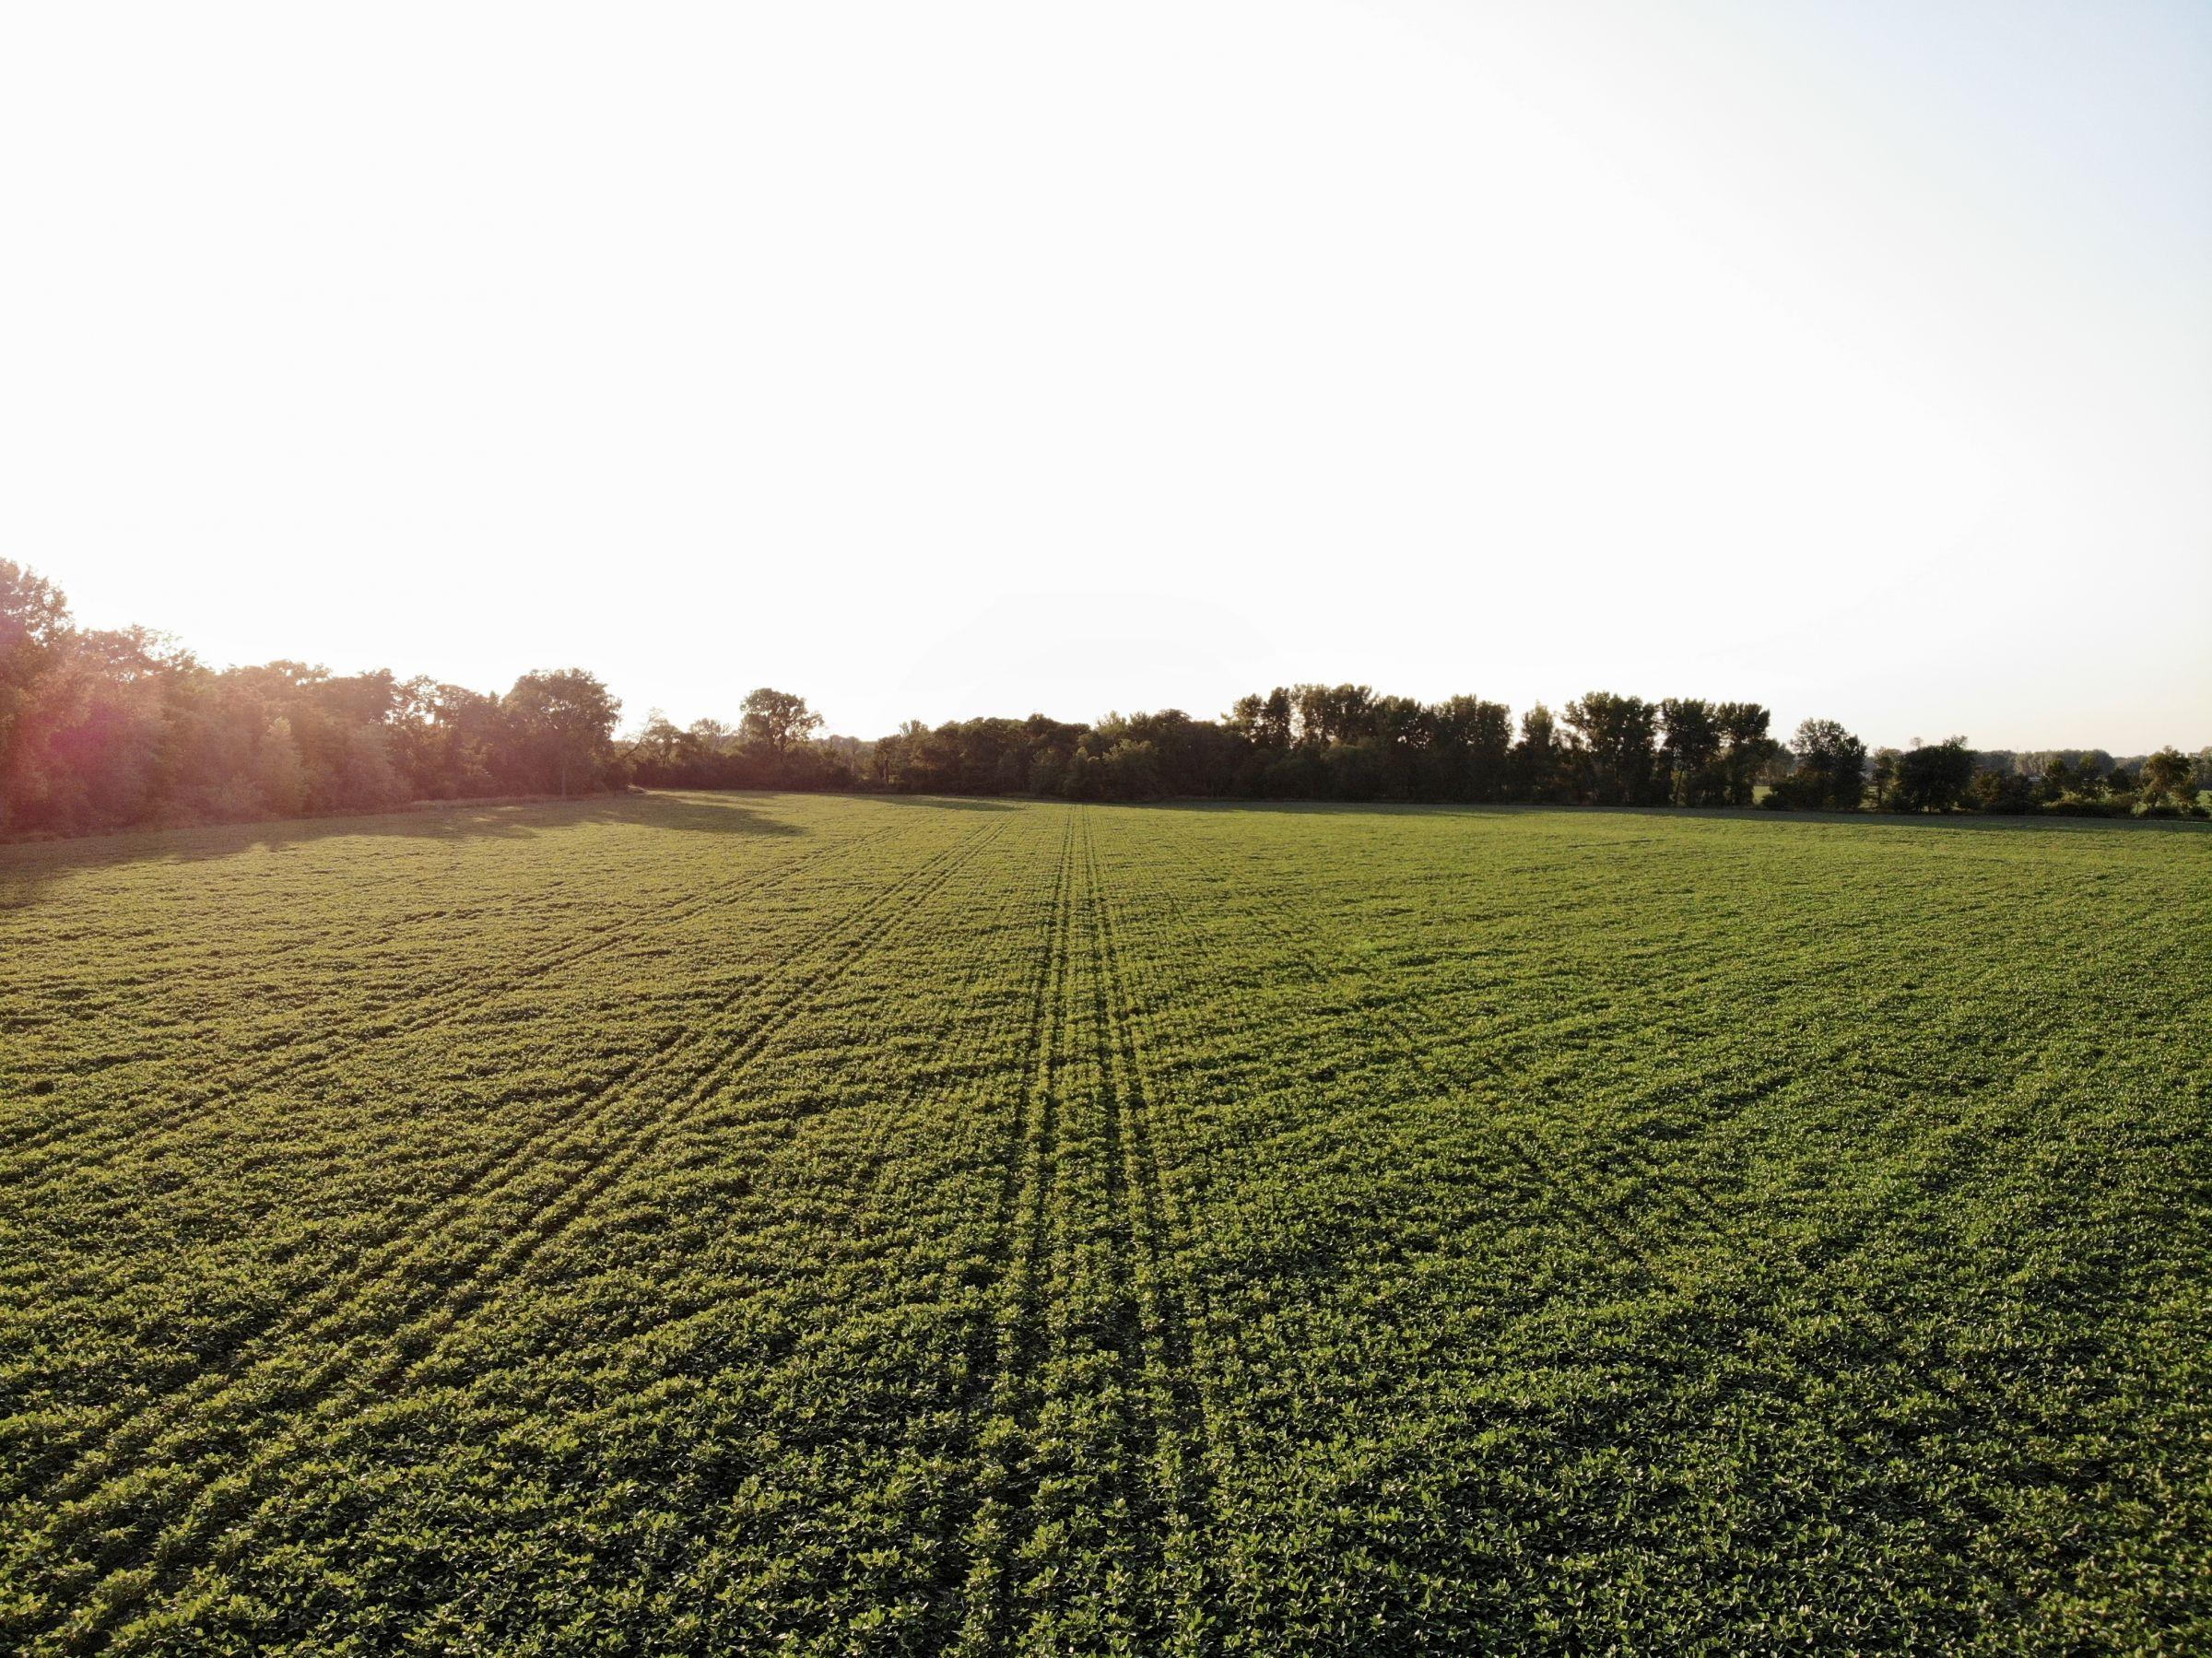 land-polk-county-iowa-89-acres-listing-number-15626-0-2021-07-09-142608.jpg